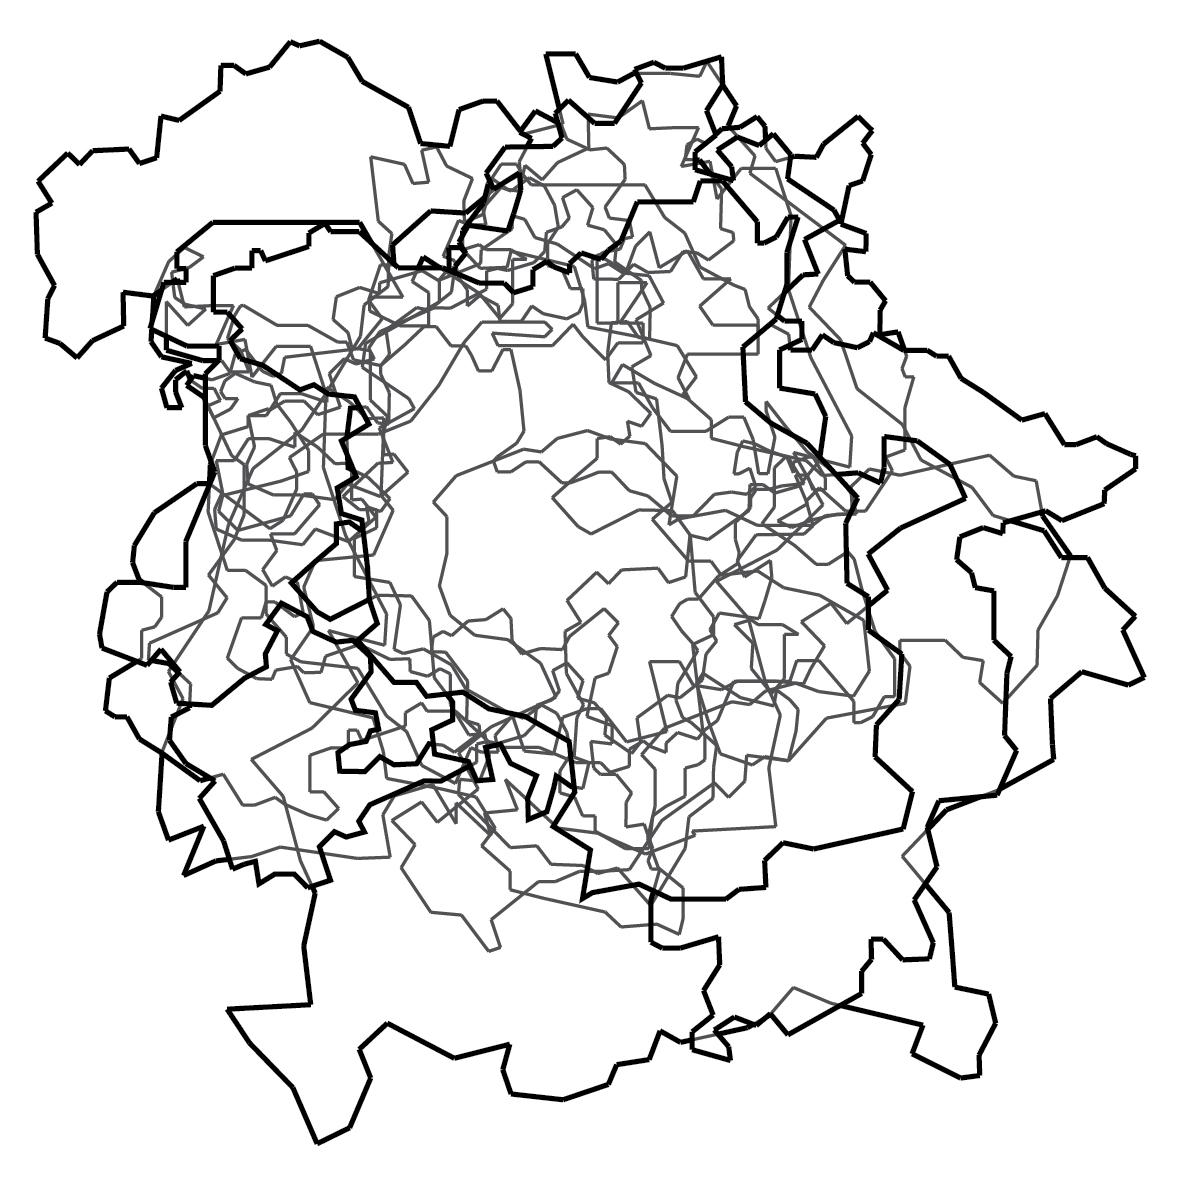 oficinaaeinheits_linework